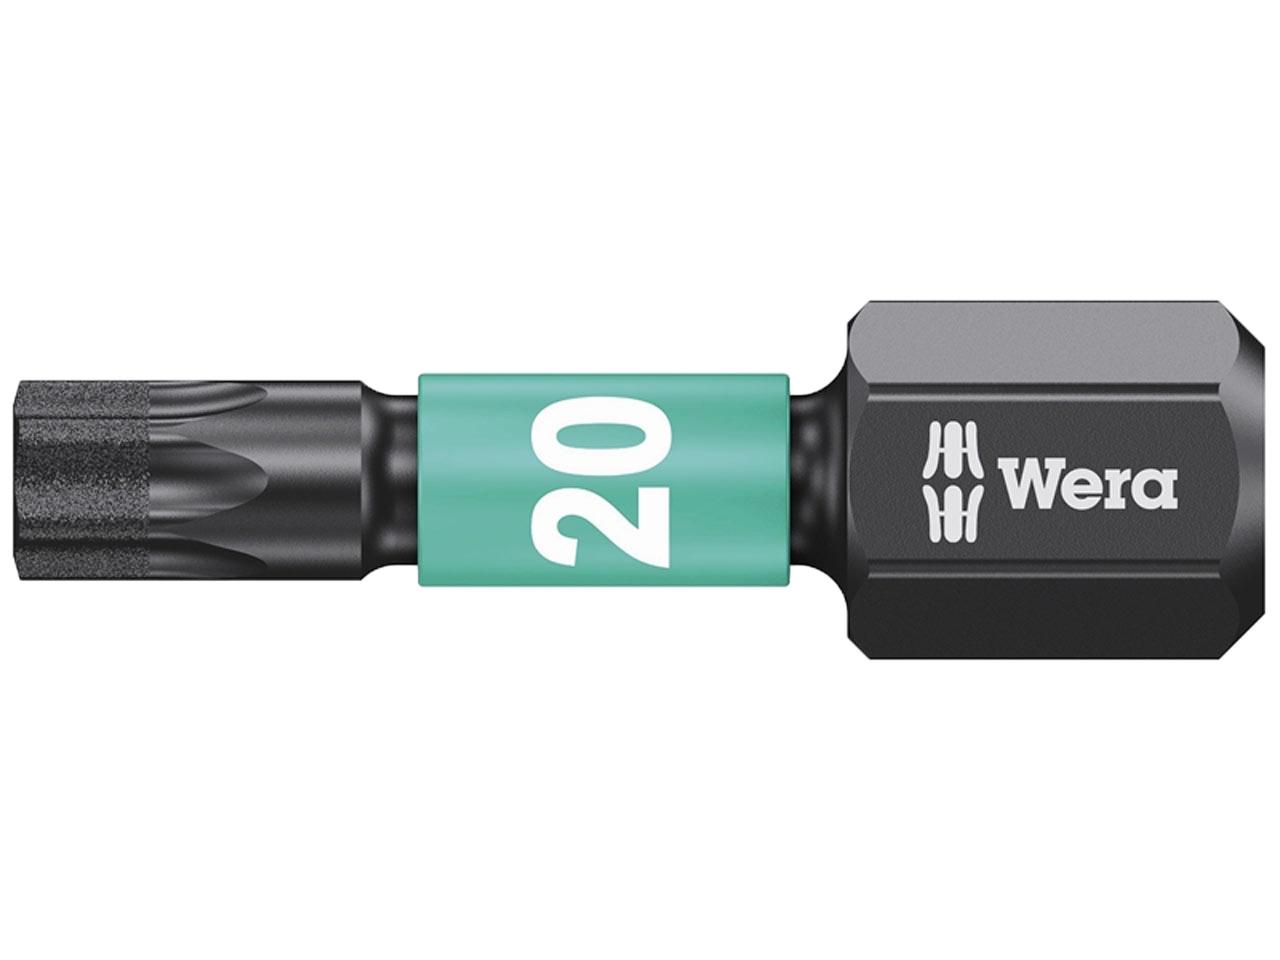 Wera WER057622 855//1 Impaktor Insert Bit Pozi PZ3 X 25 Mm Box 10